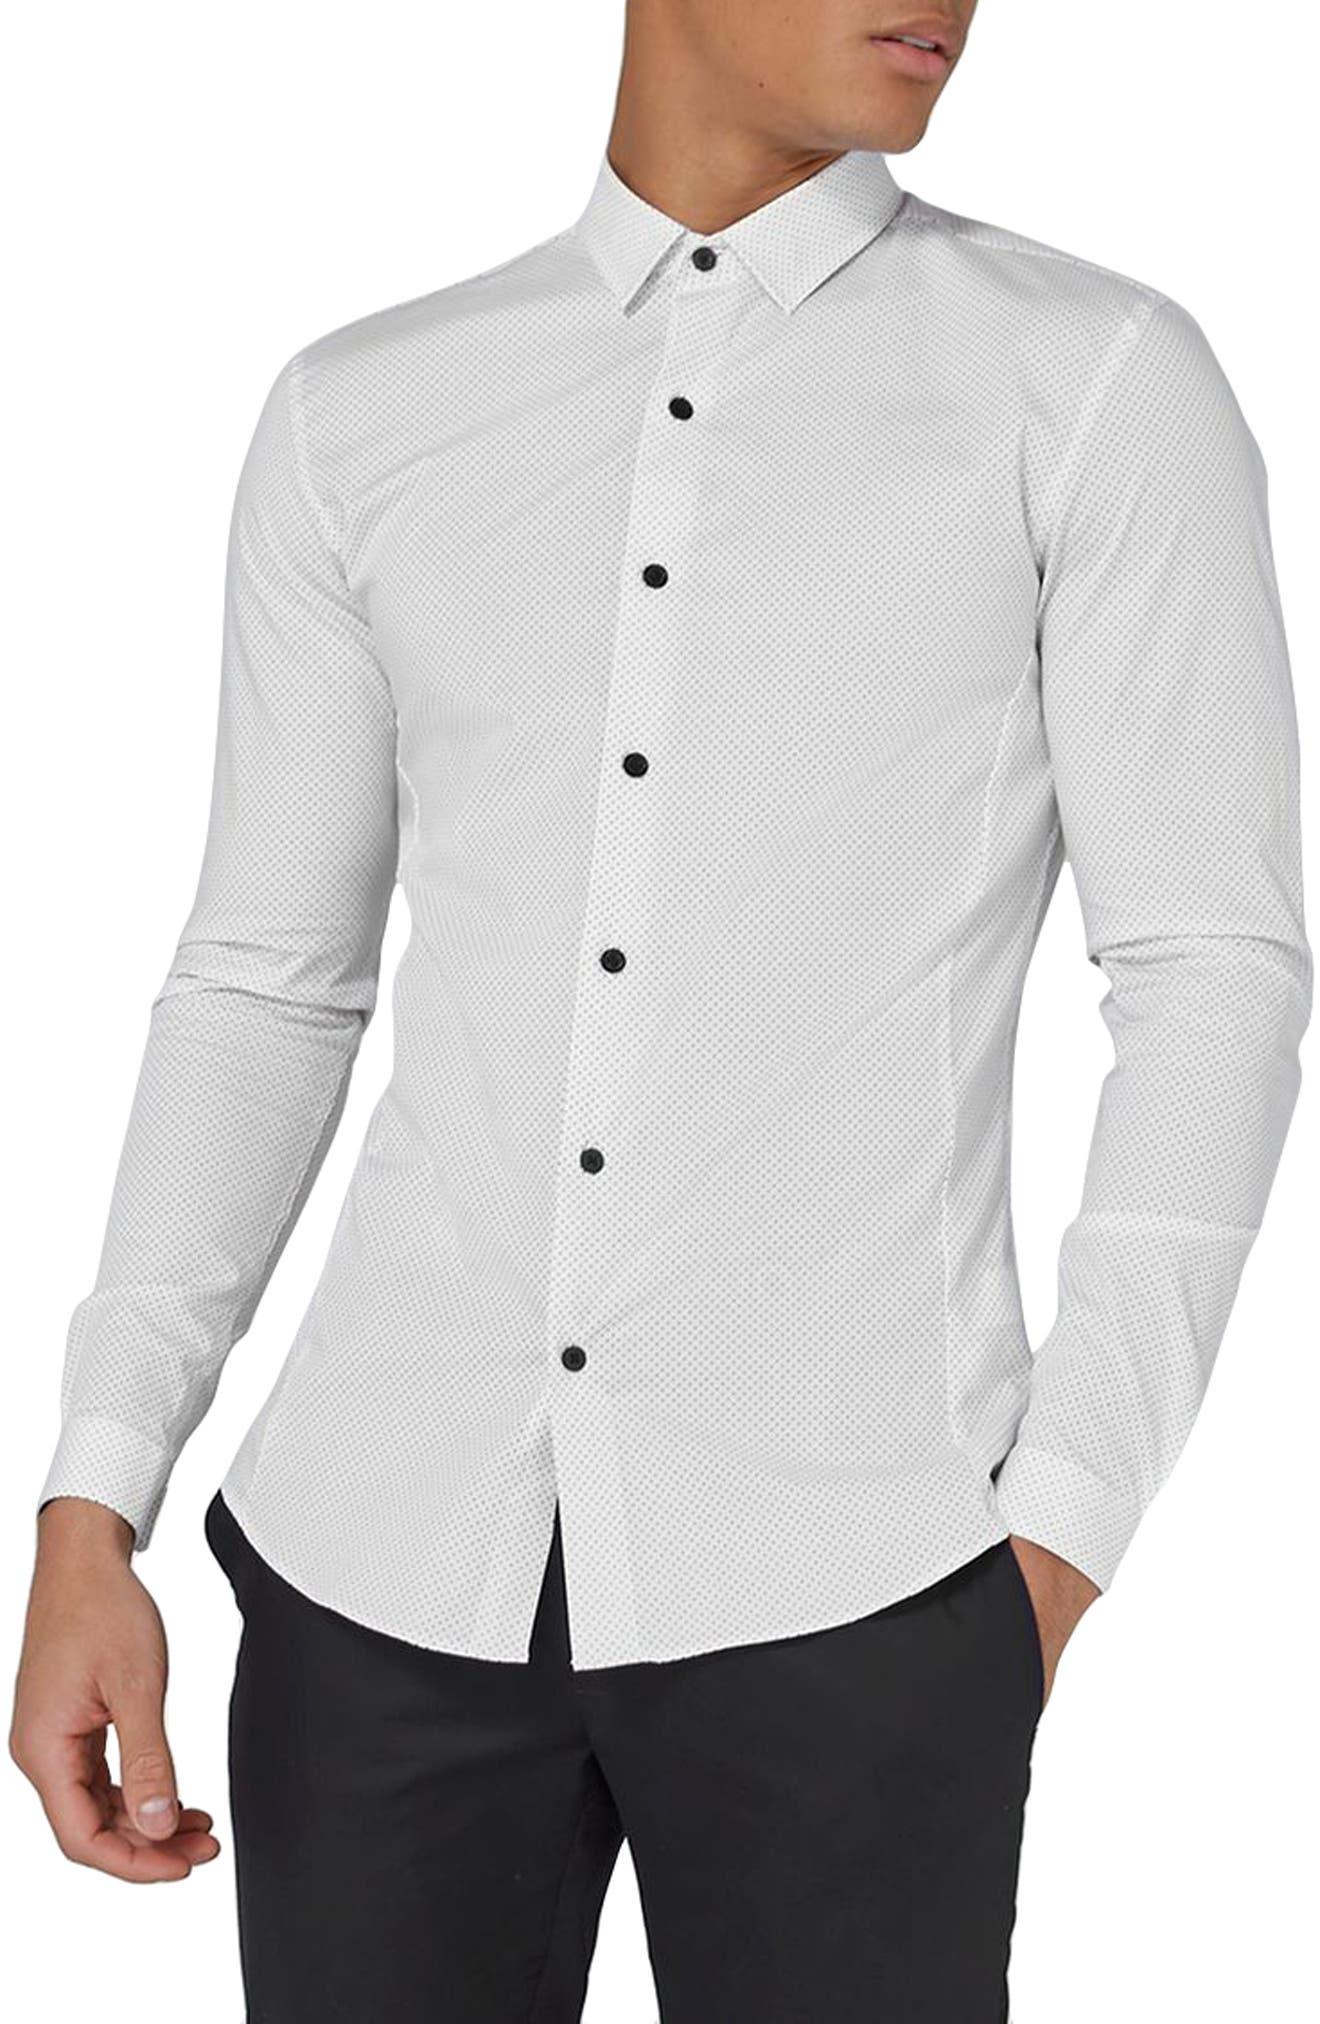 Muscle Fit Polka Dot Sport Shirt,                             Main thumbnail 1, color,                             White Multi